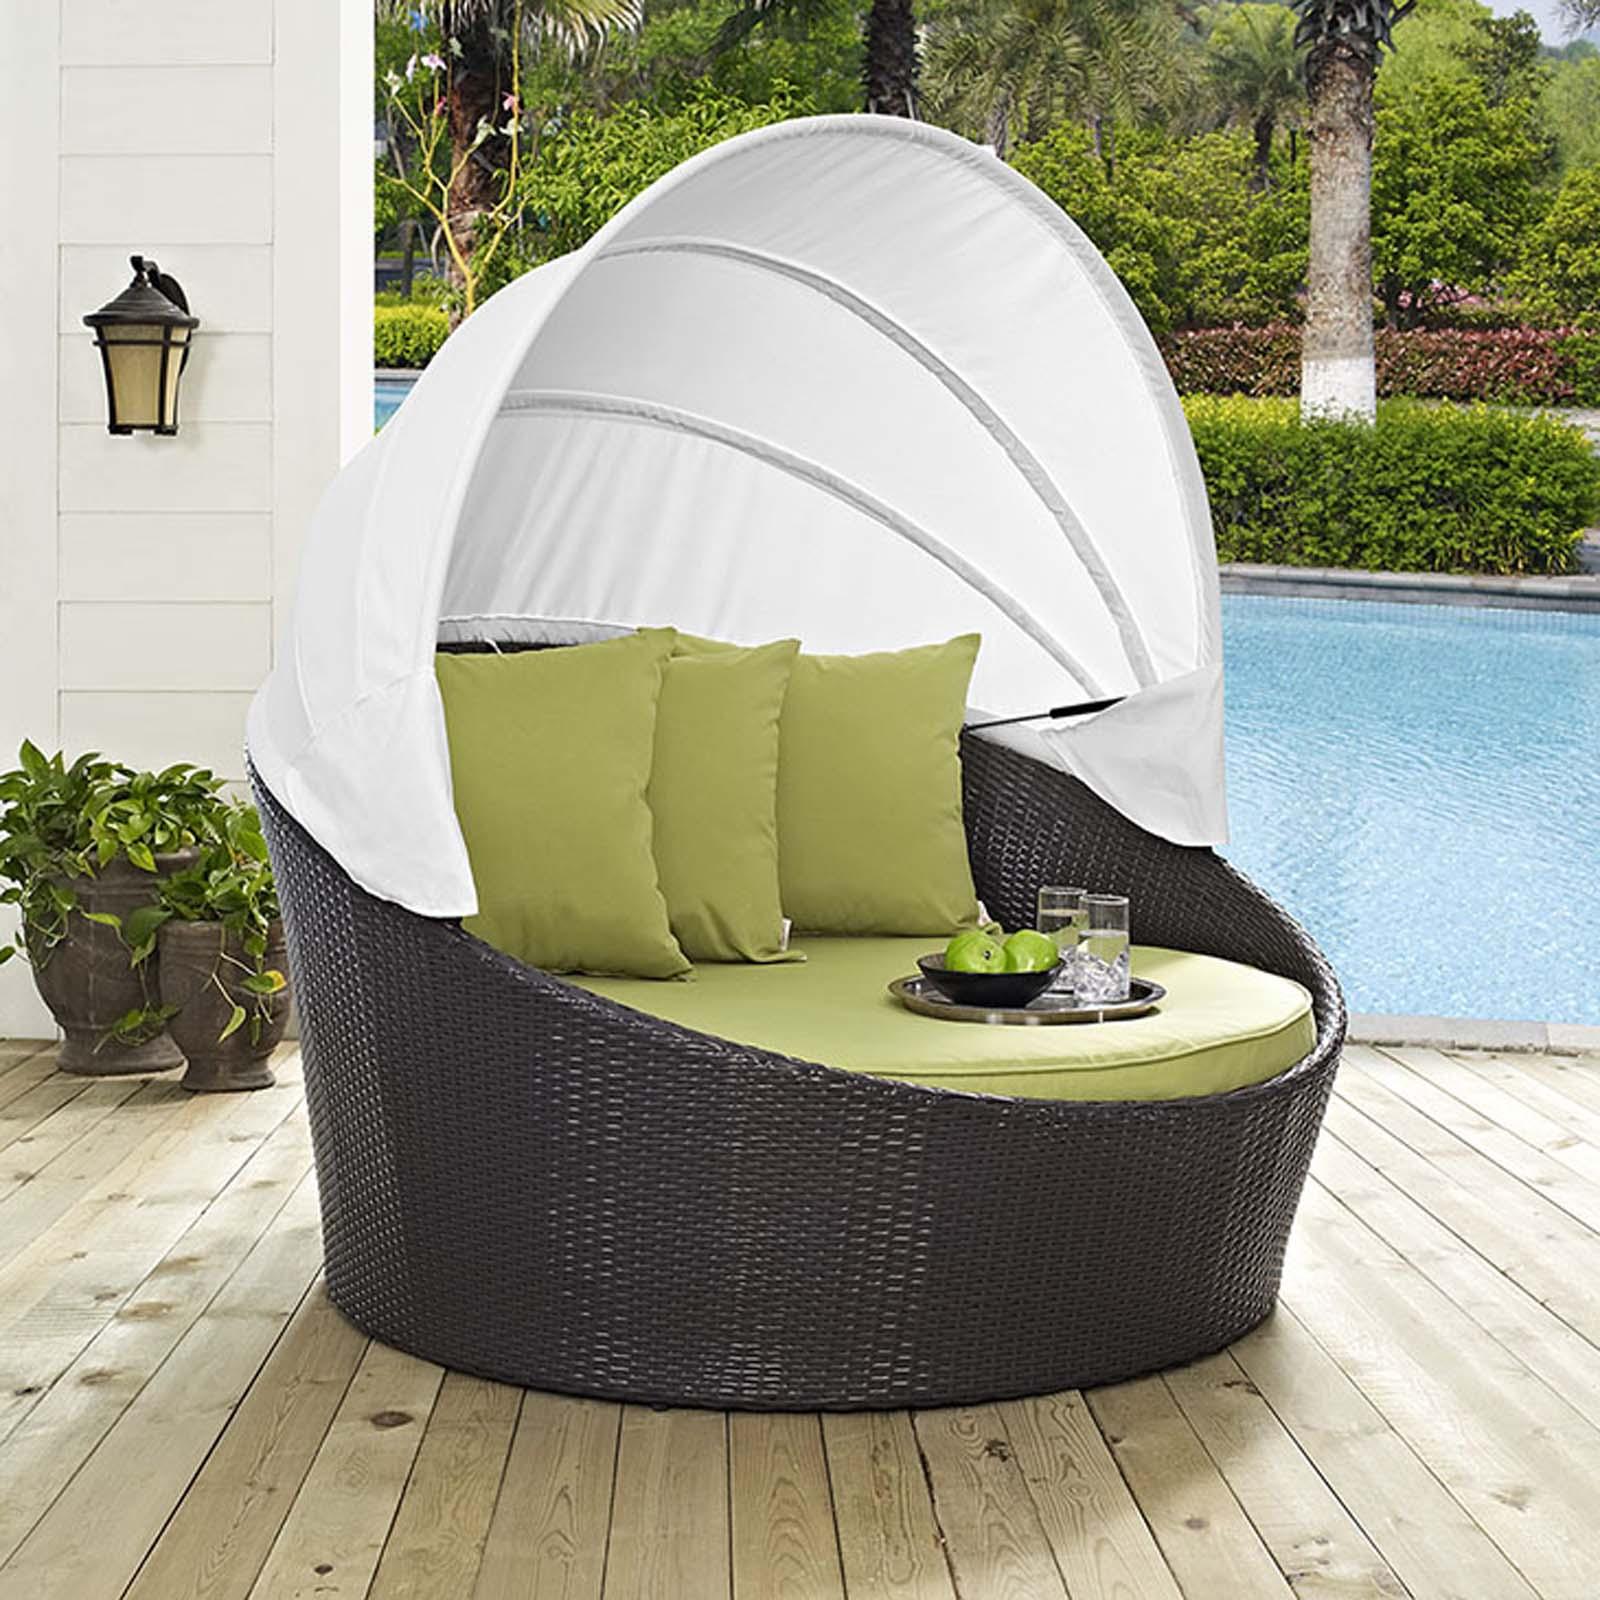 Modterior Outdoor Daybeds Convene Canopy Outdoor